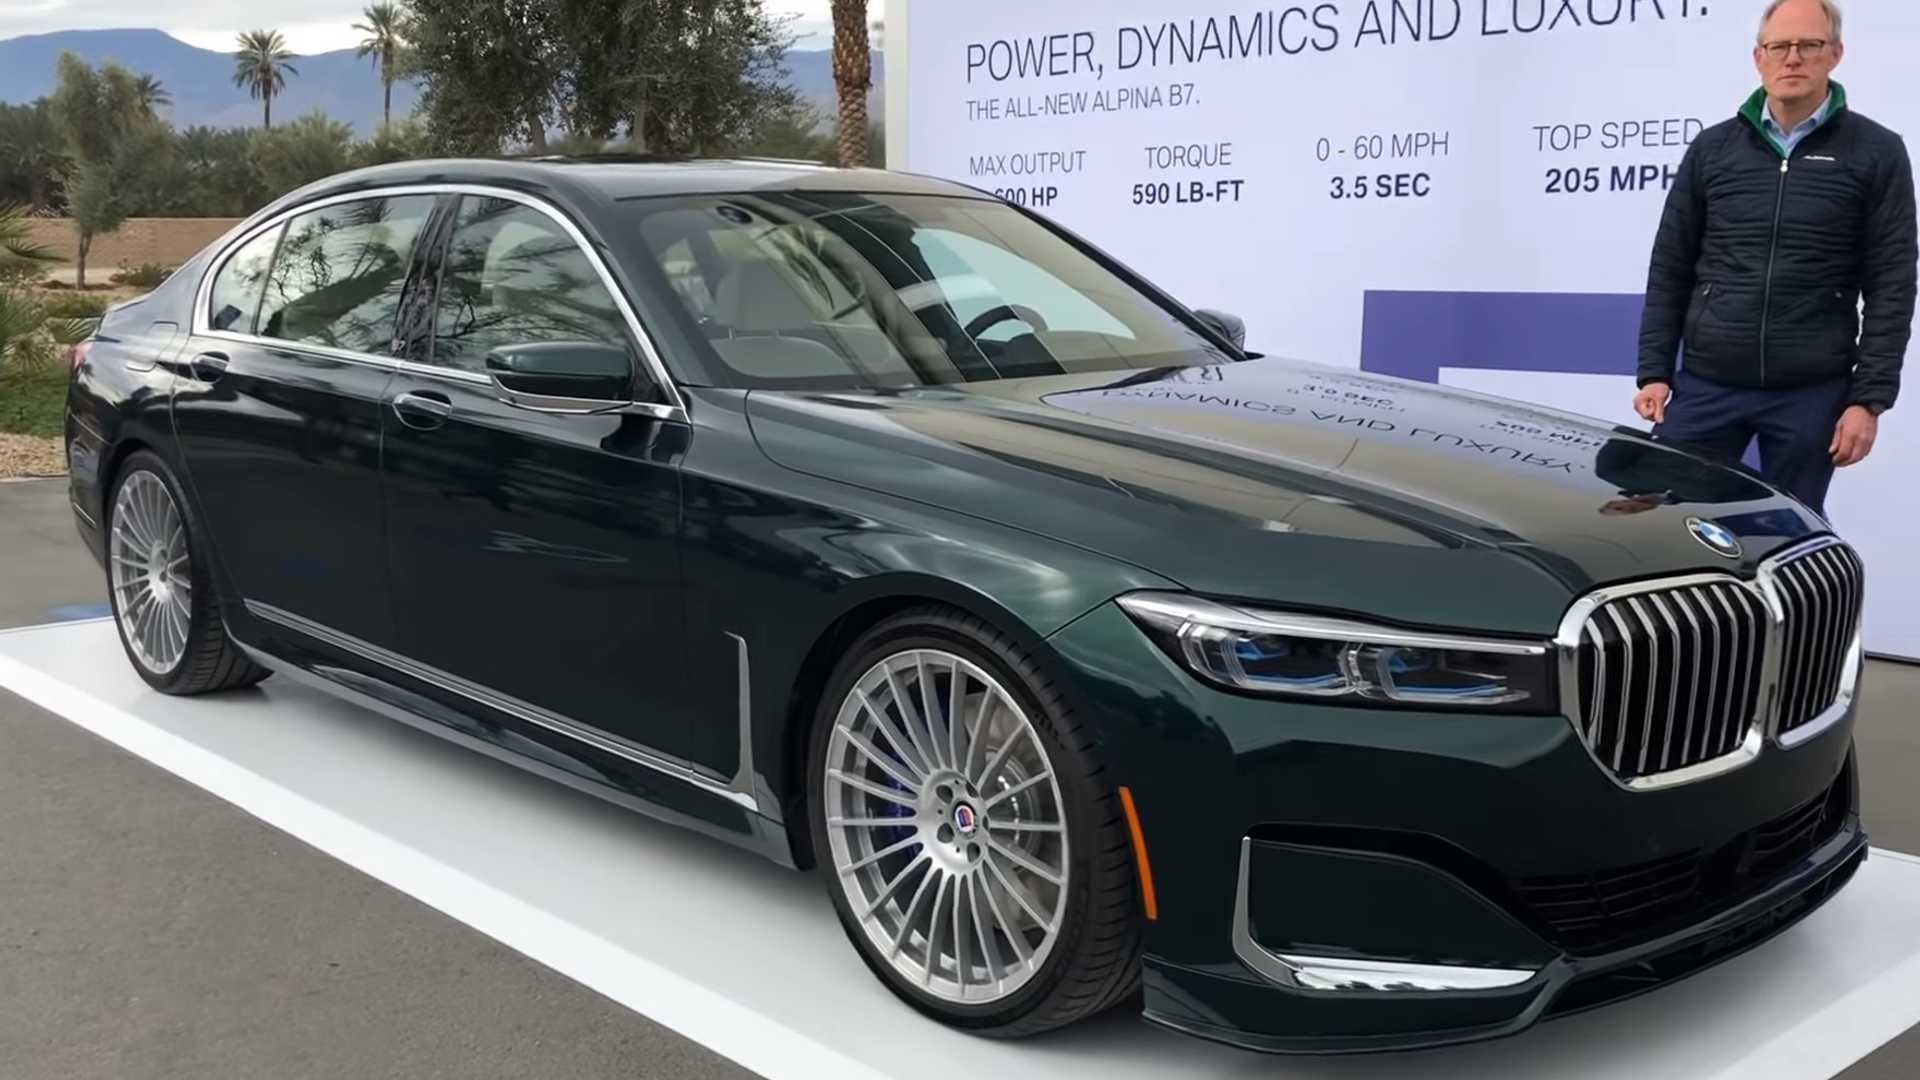 95 All New BMW B7 Alpina 2020 Price Concept for BMW B7 Alpina 2020 Price